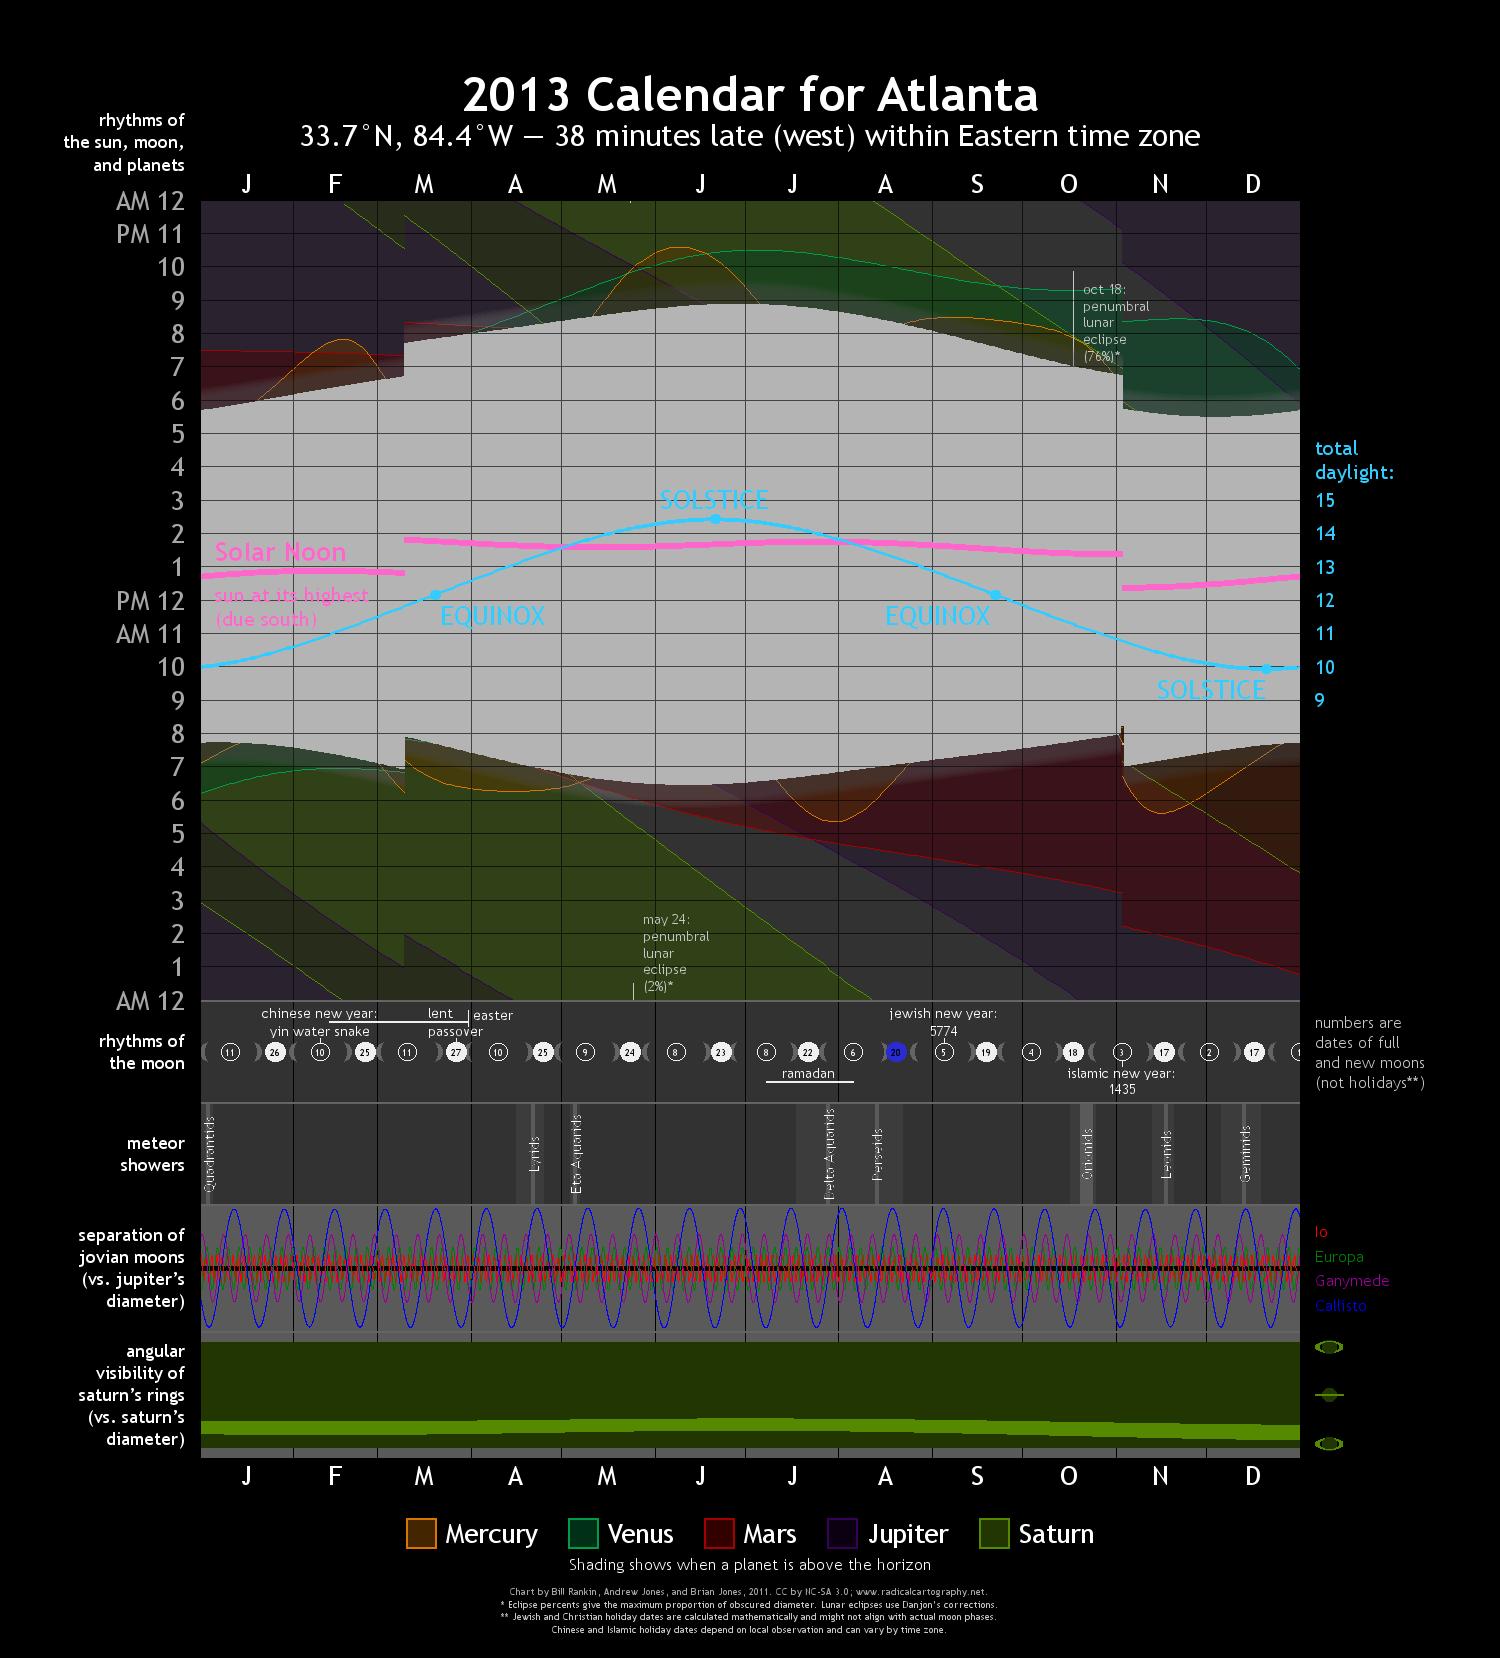 2013 Calendar for Atlanta